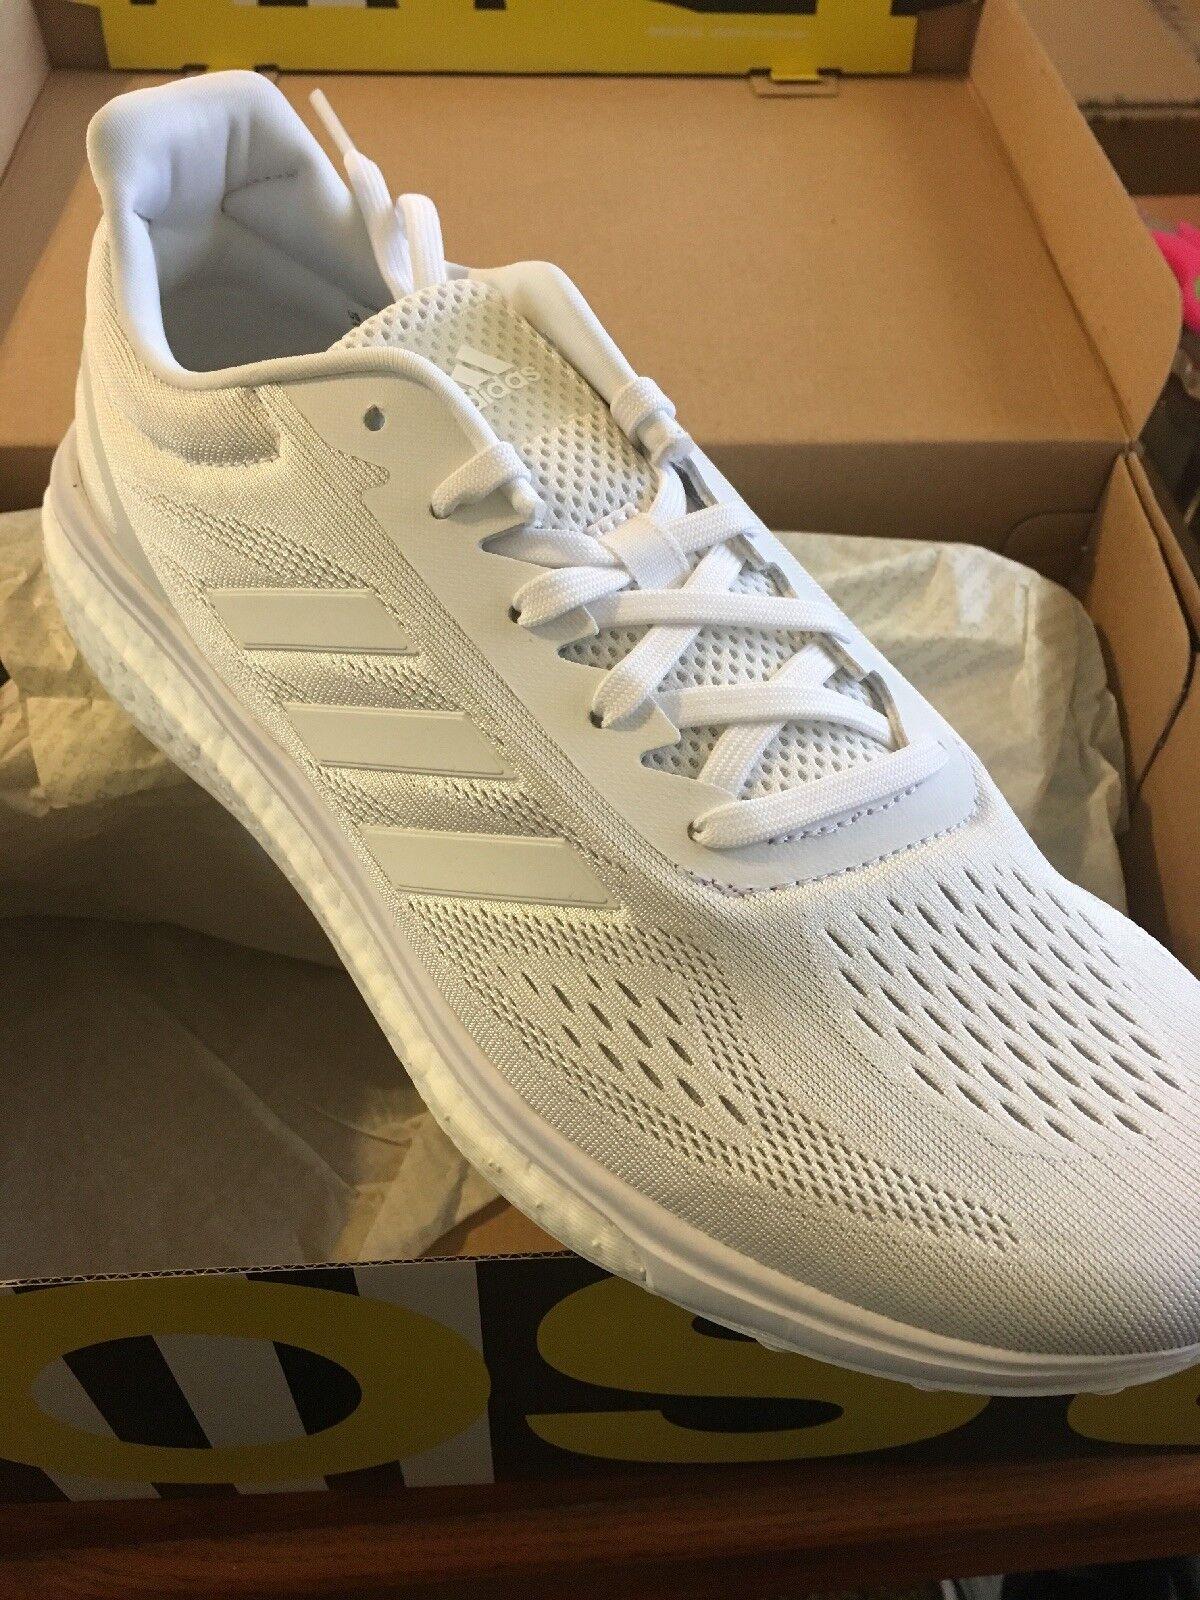 Mens Adidas Response LT size 9.5